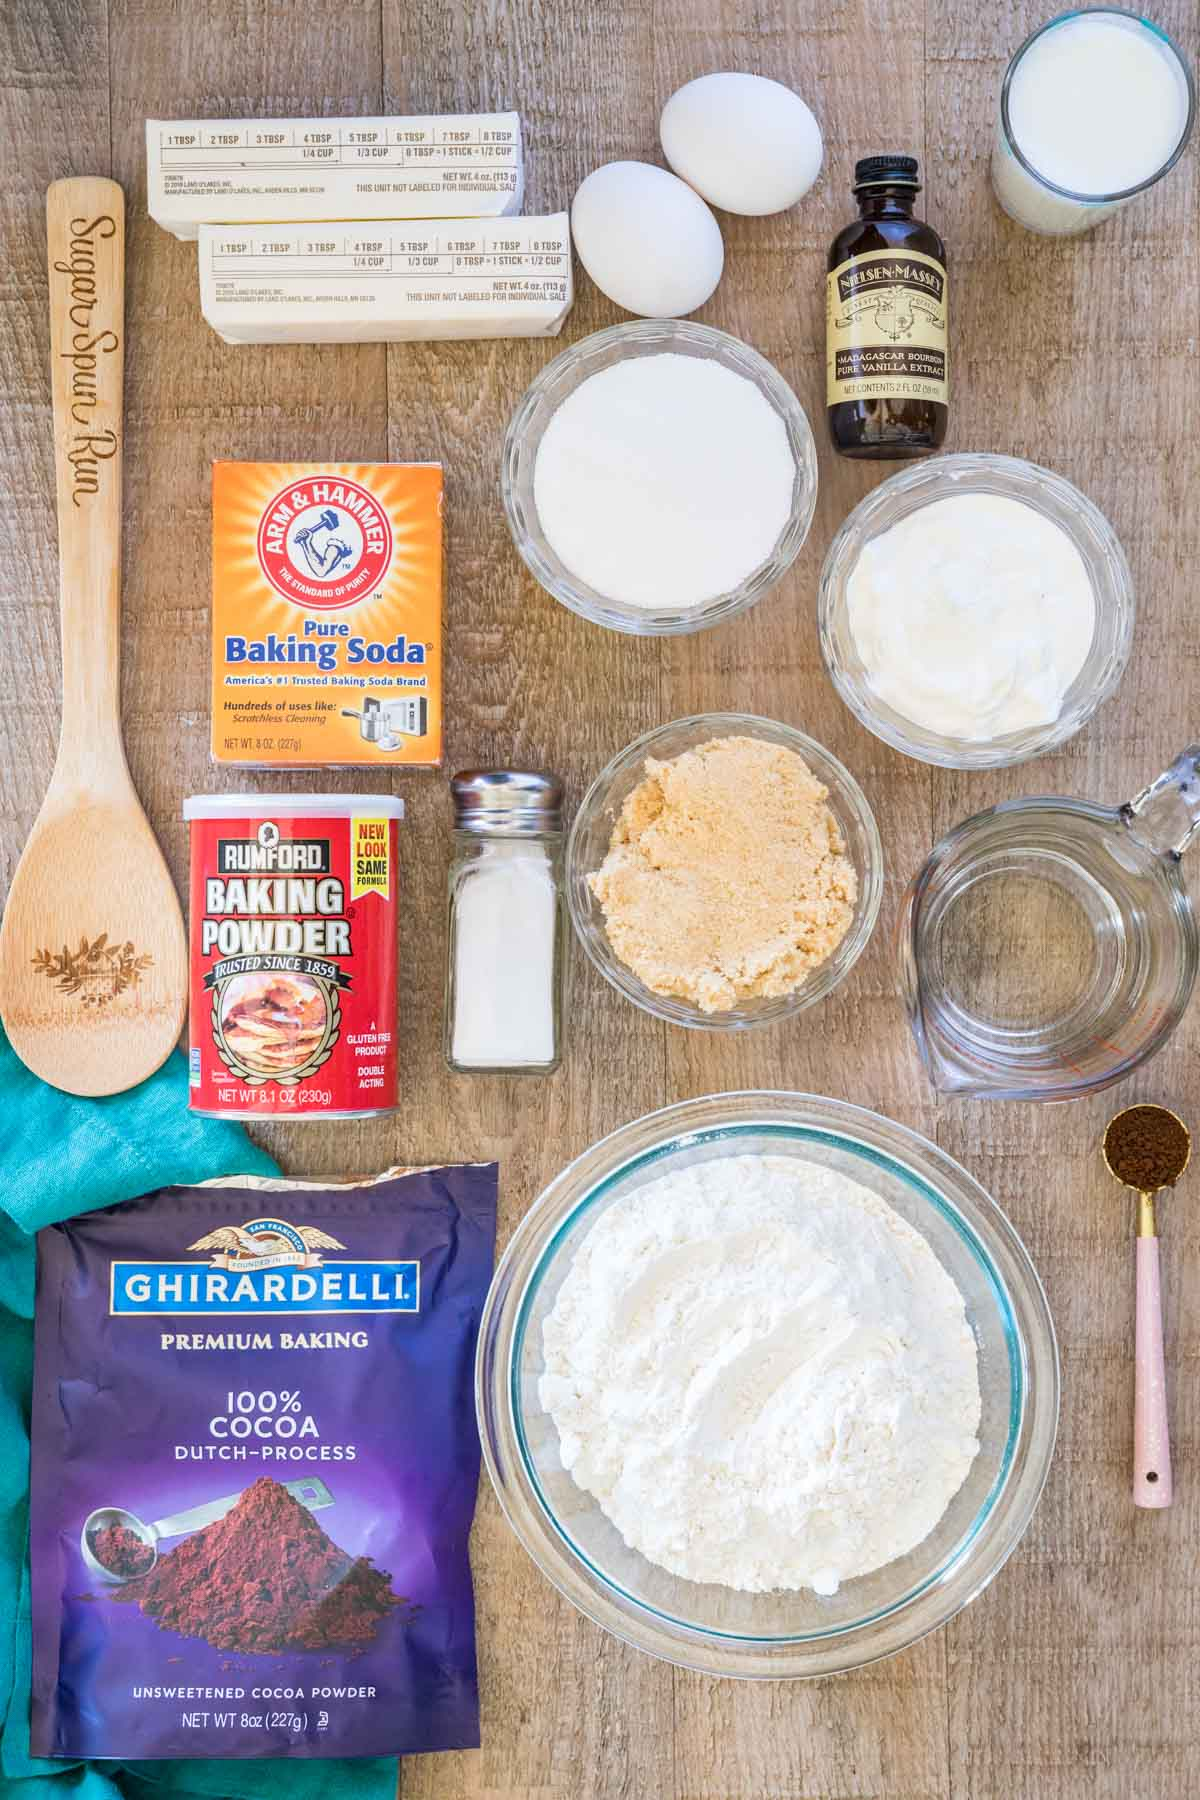 Ingredients for devil's food cake